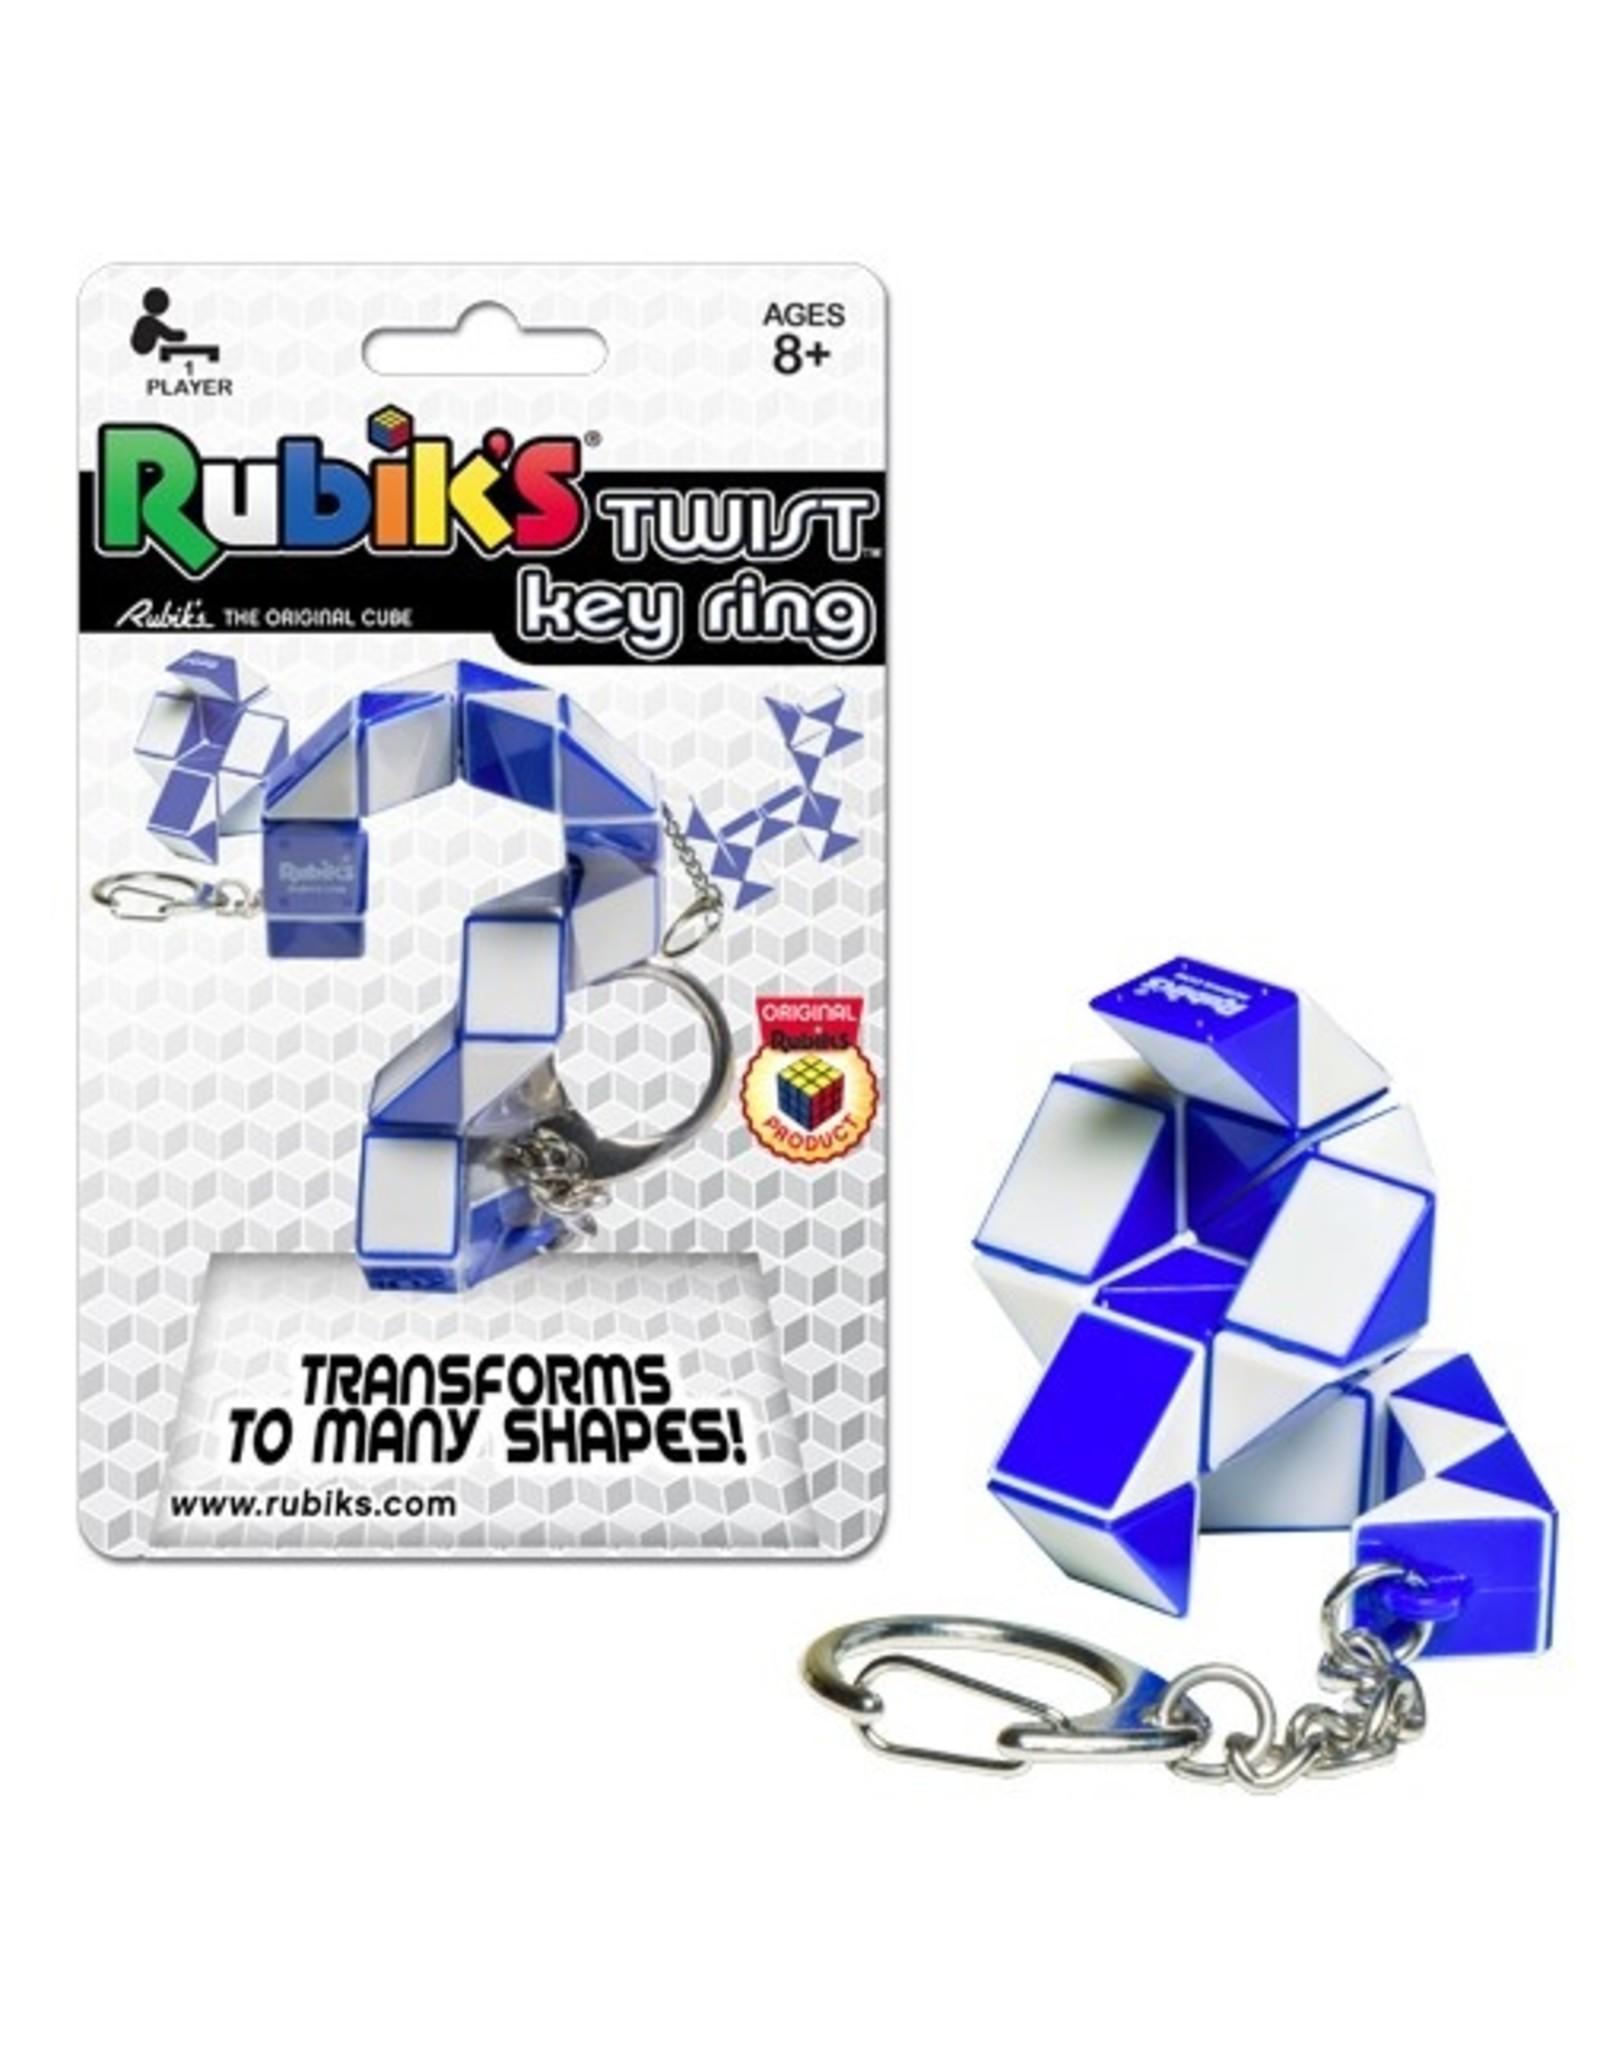 Winning Moves Games Rubik's Twist Key Ring